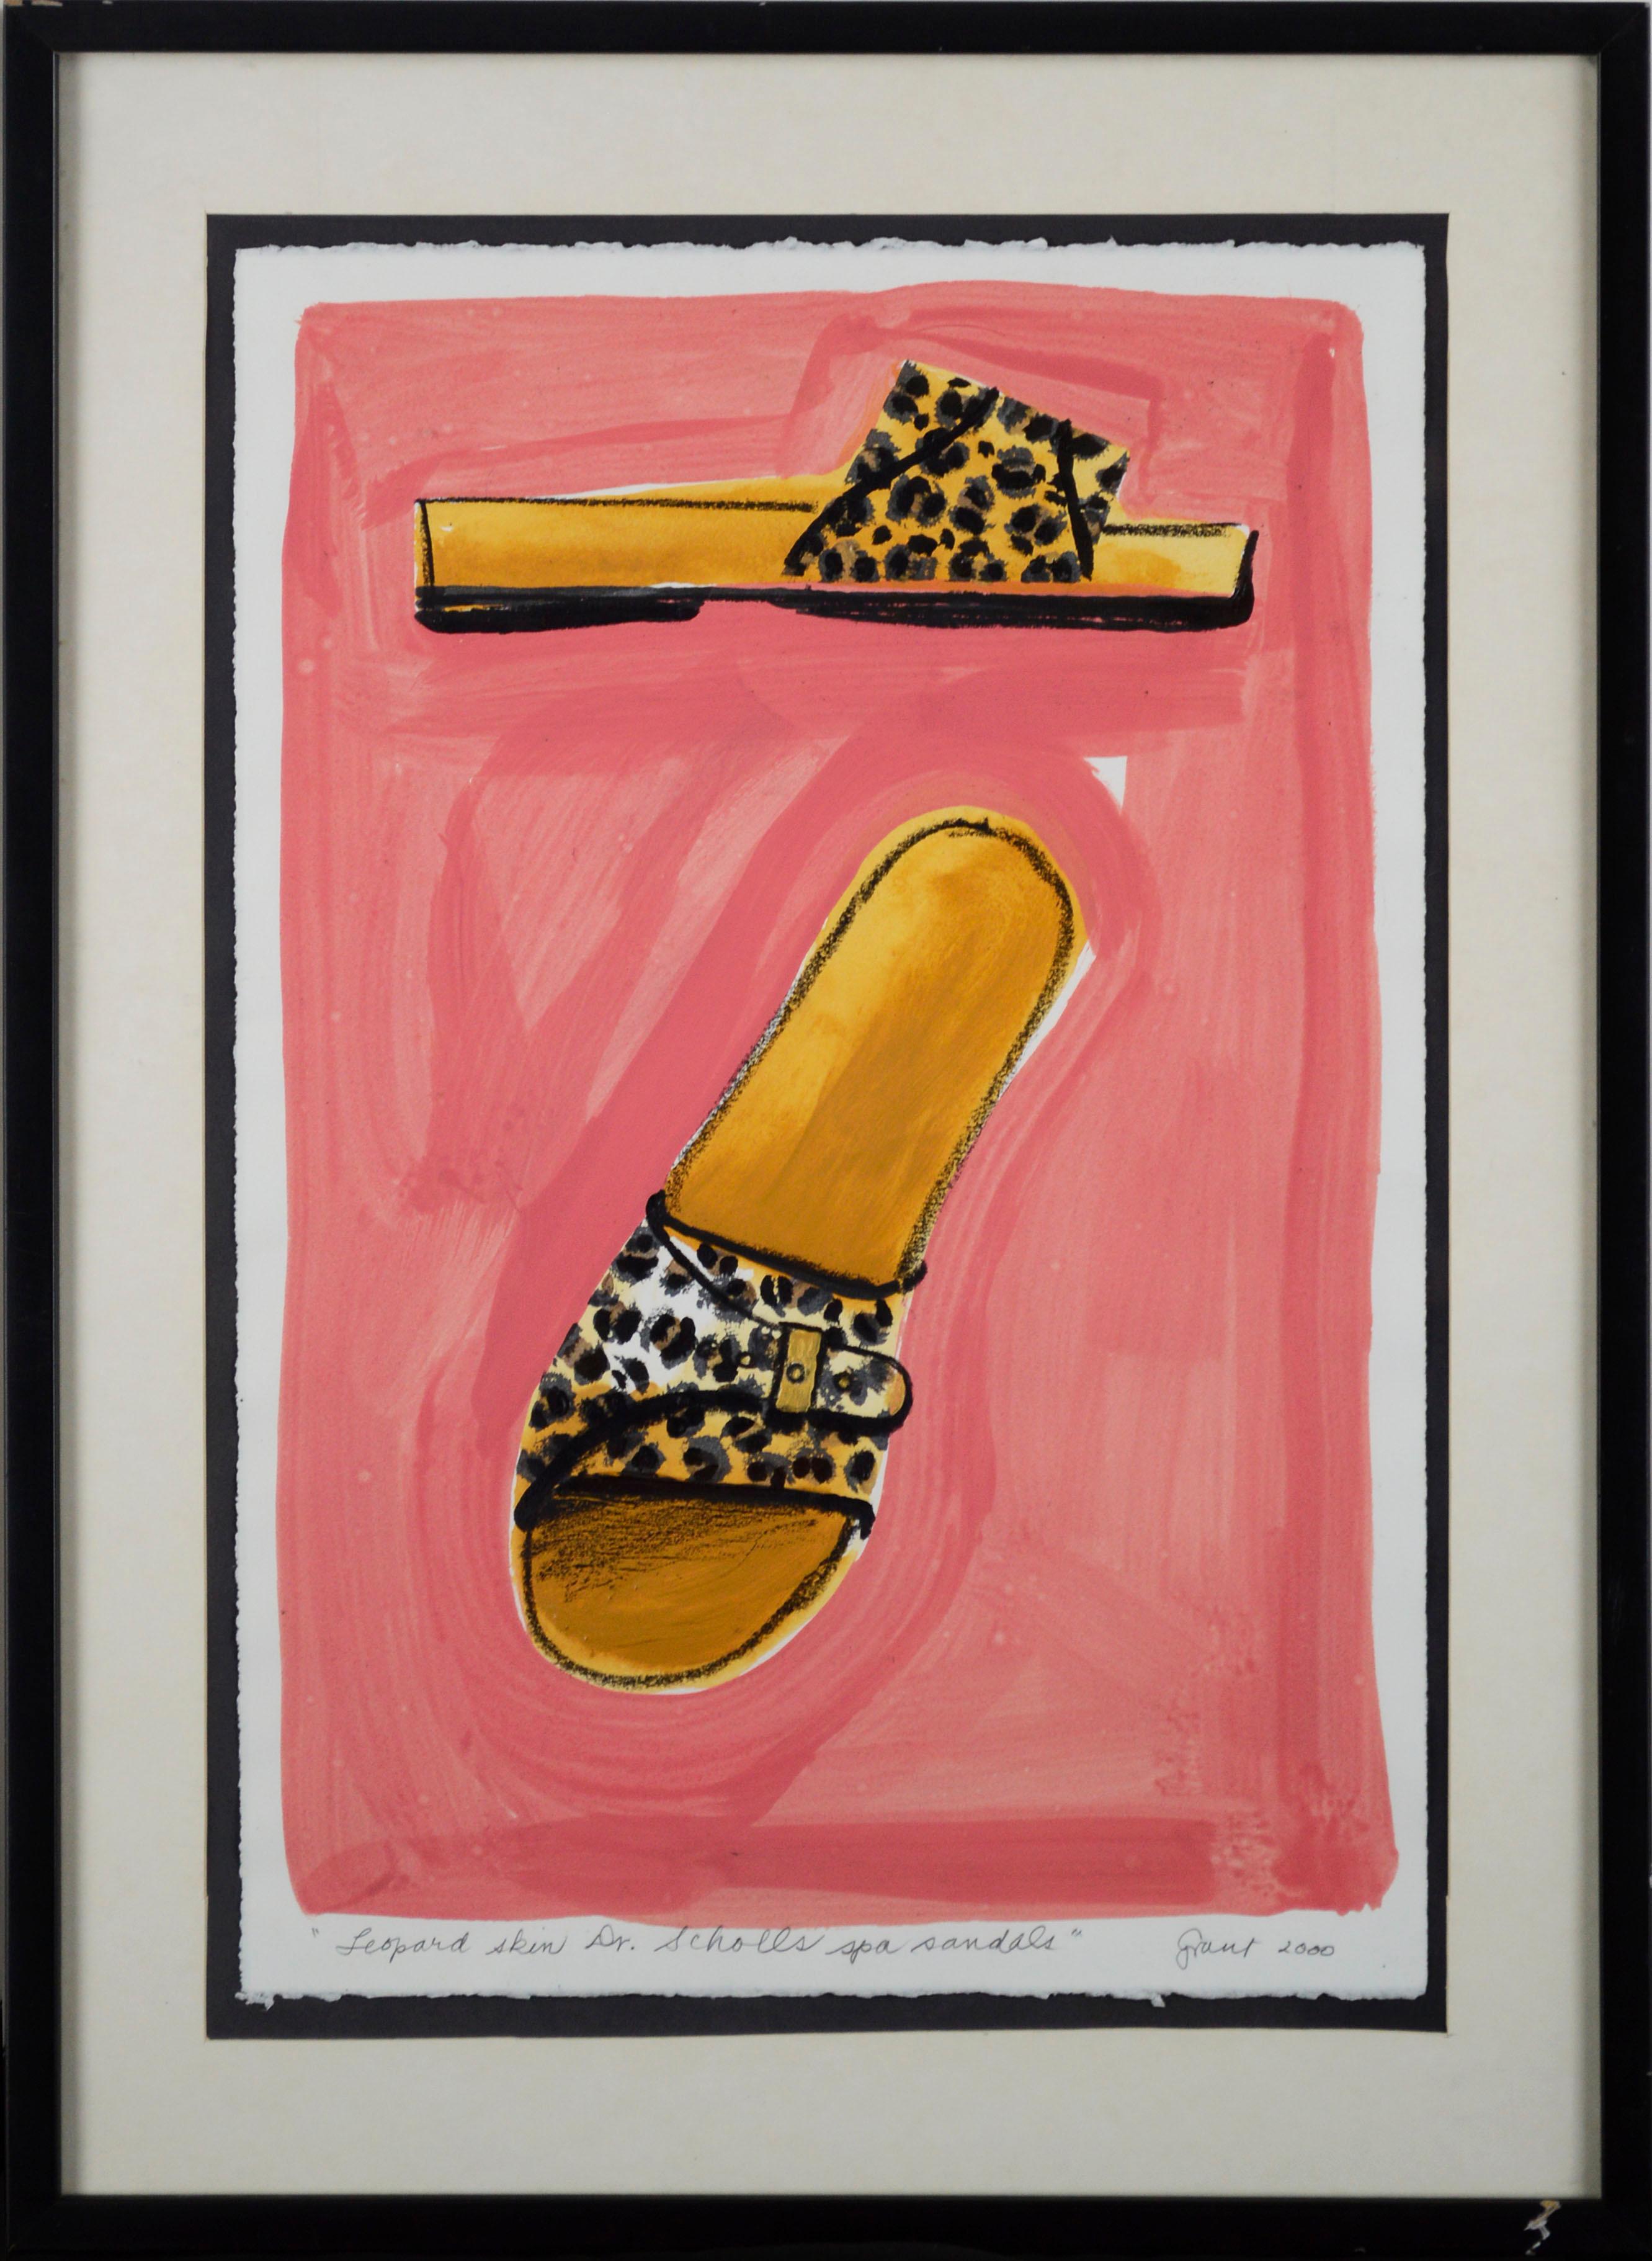 """Leopard Skin Dr. Scholl's Spa Sandals"" - Fashion Pop Art Still Life"